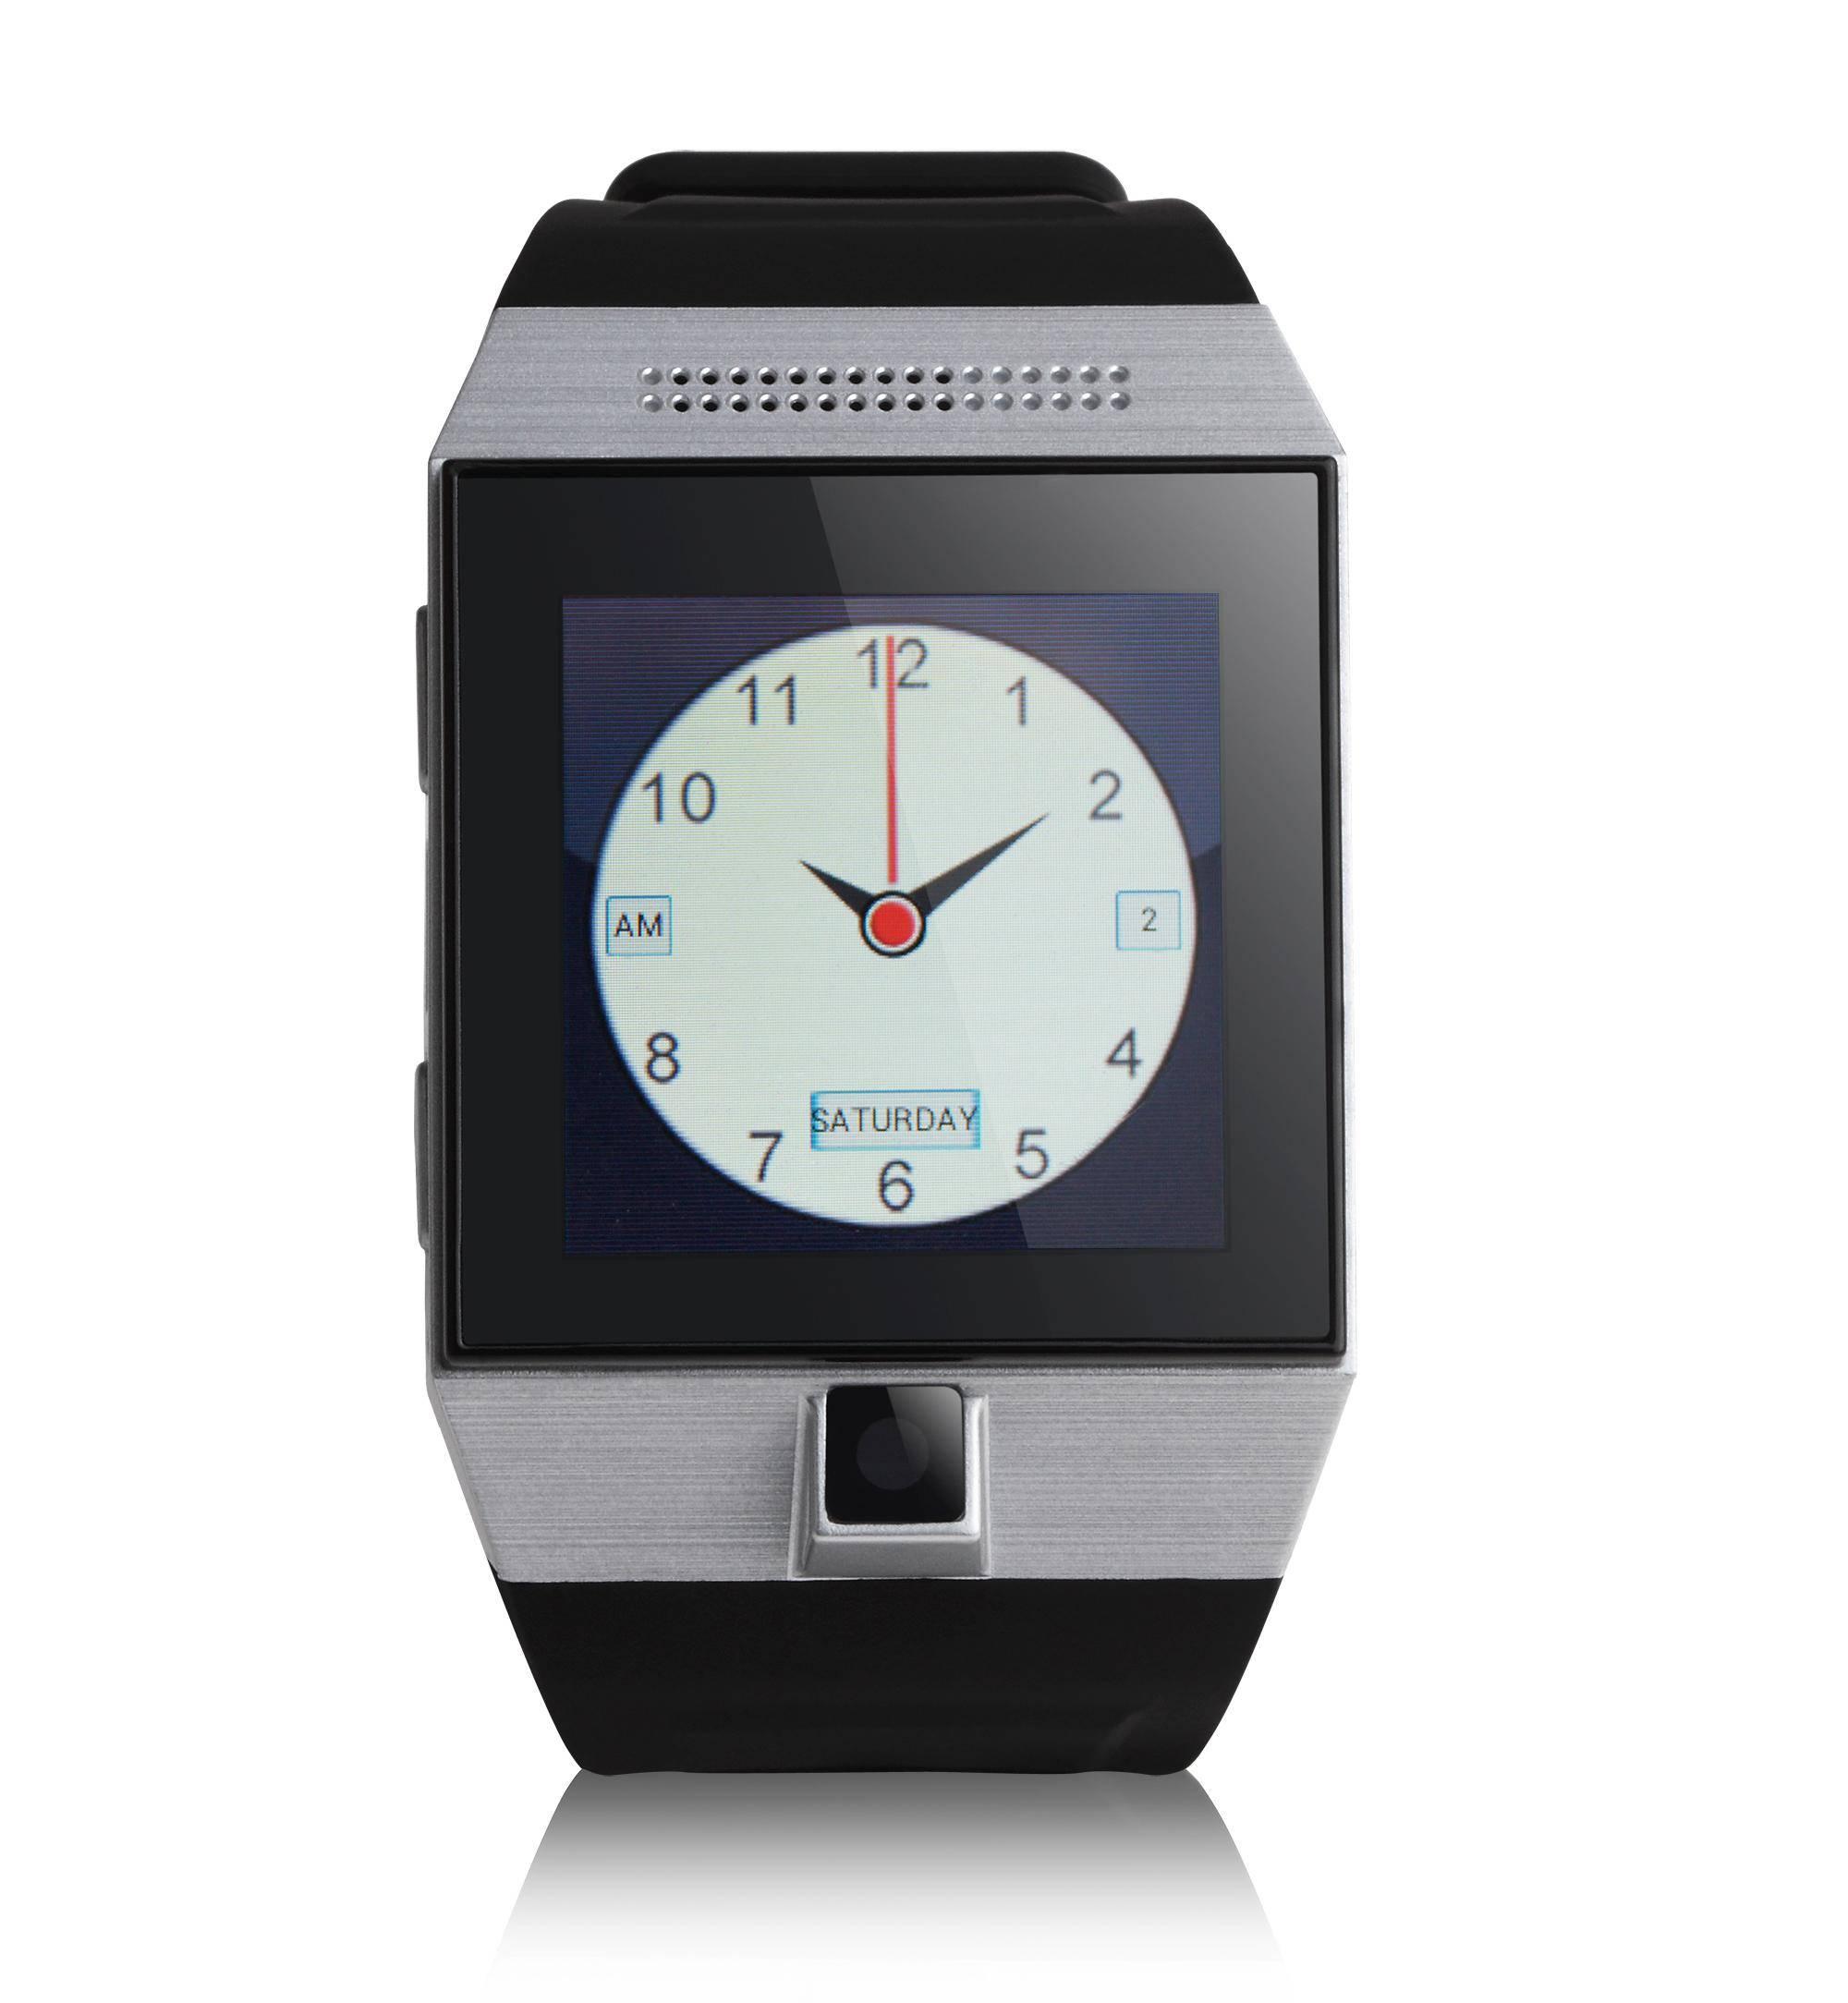 Smart Watch Phone Android 4.0Smart Watch Phone Android 4.0 Bluetooth Watch Phone